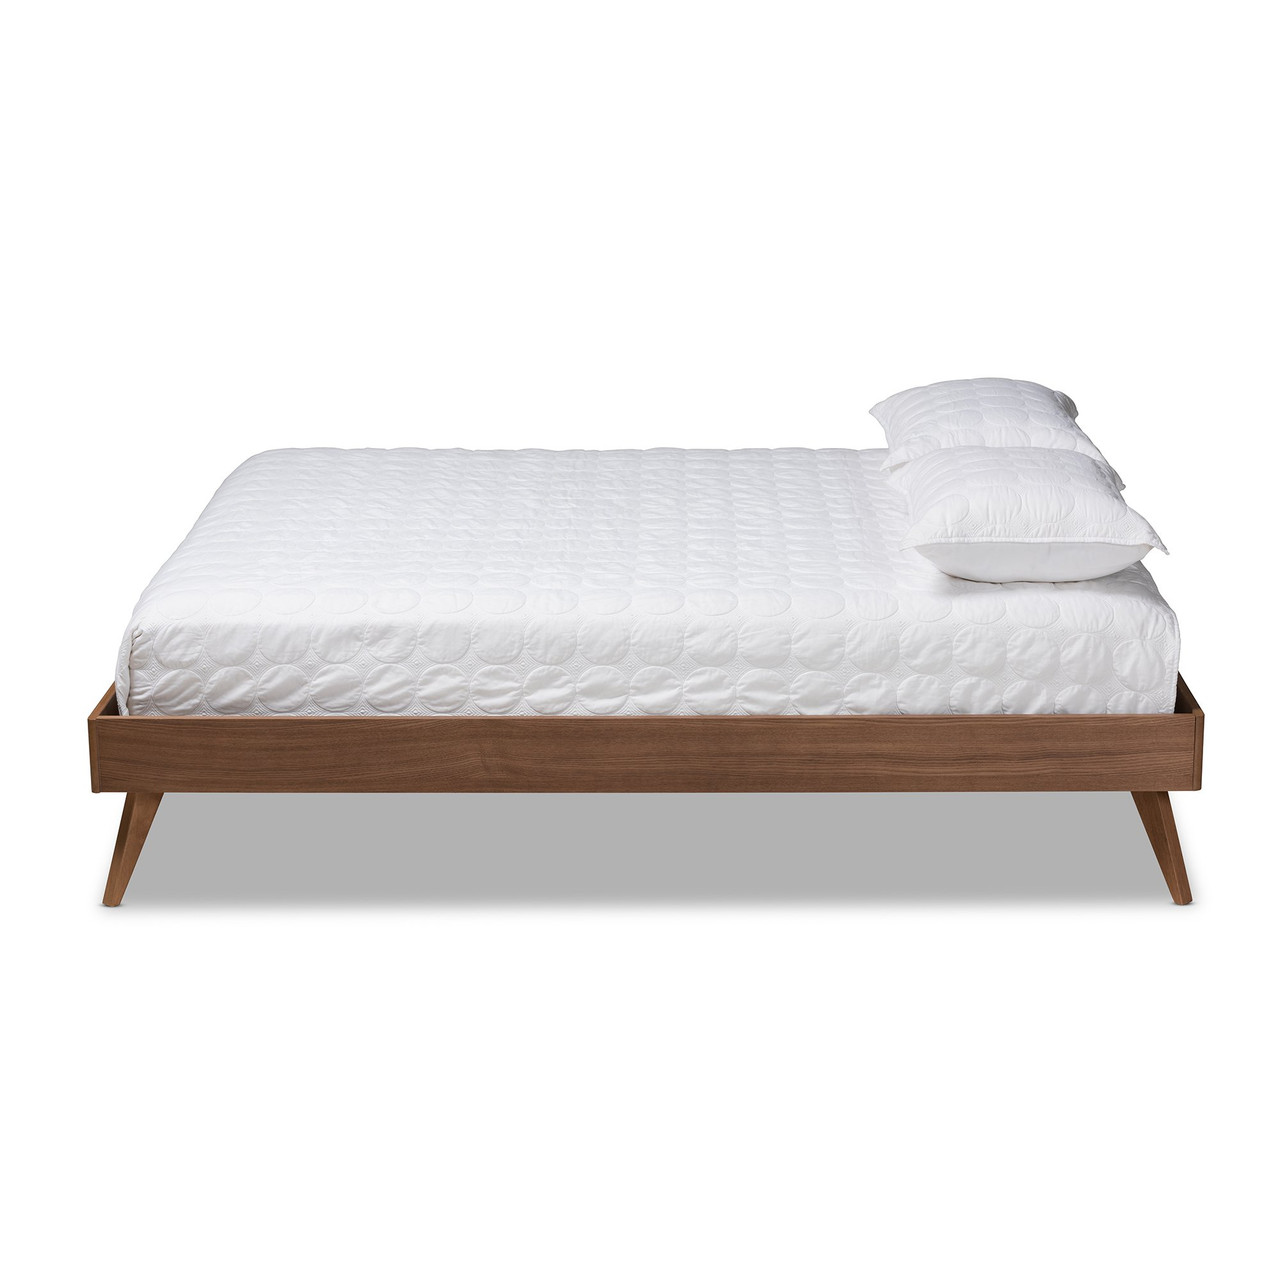 baxton lissette mid century modern walnut brown finished wood queen size platform bed frame mg9704 ash walnut bed frame queen